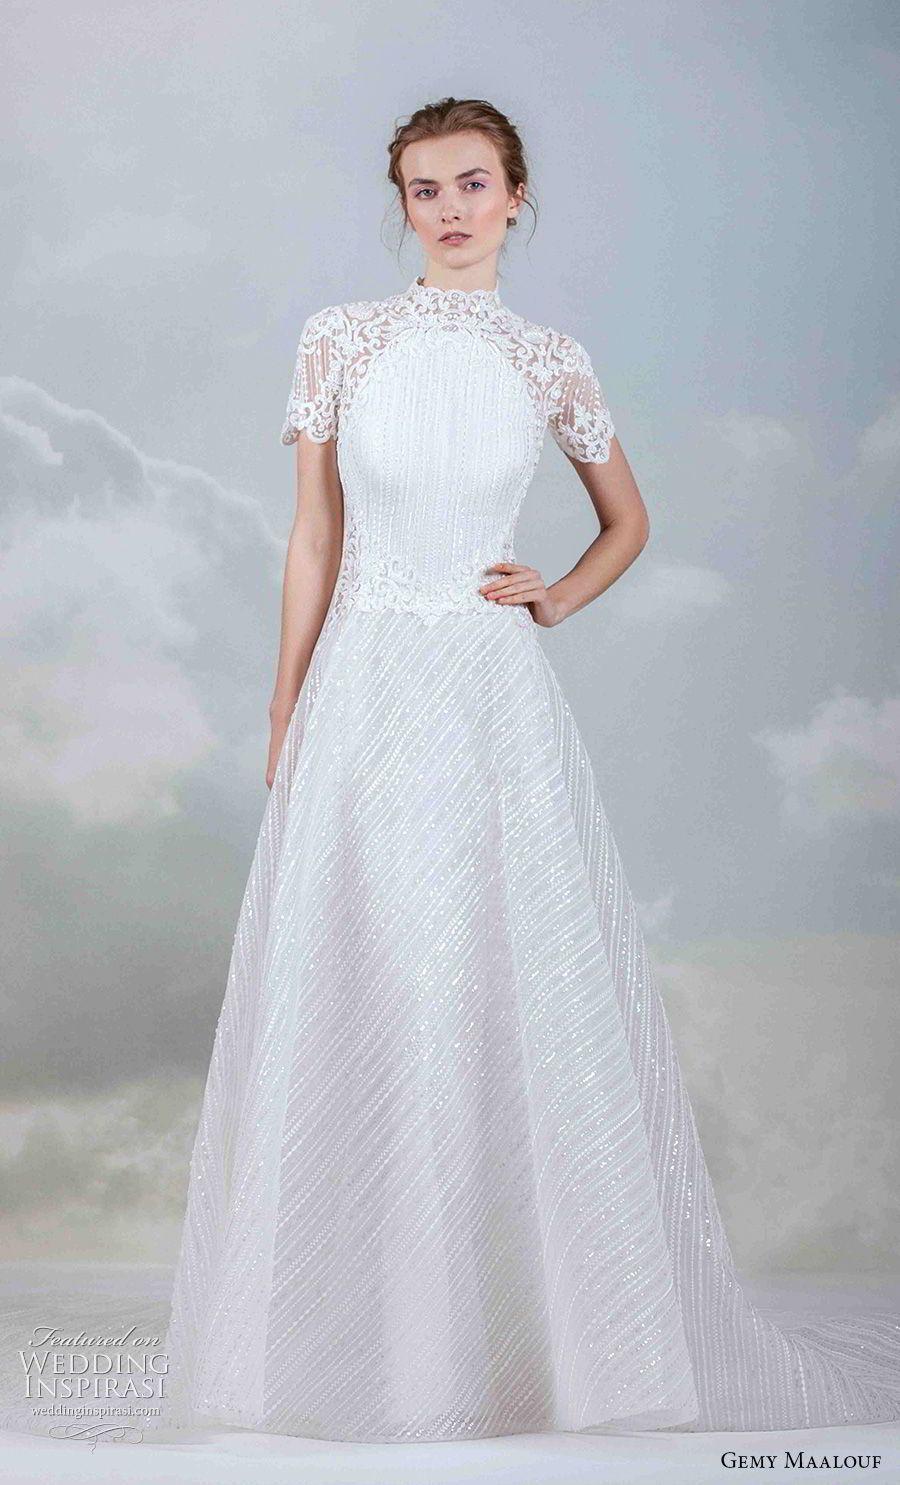 Gemy Maalouf 2019 Wedding Dresses The Royal Bride Bridal Collection Wedding Inspirasi Wedding Dress Necklines Wedding Dresses High Neckline Wedding Dress [ 1485 x 900 Pixel ]